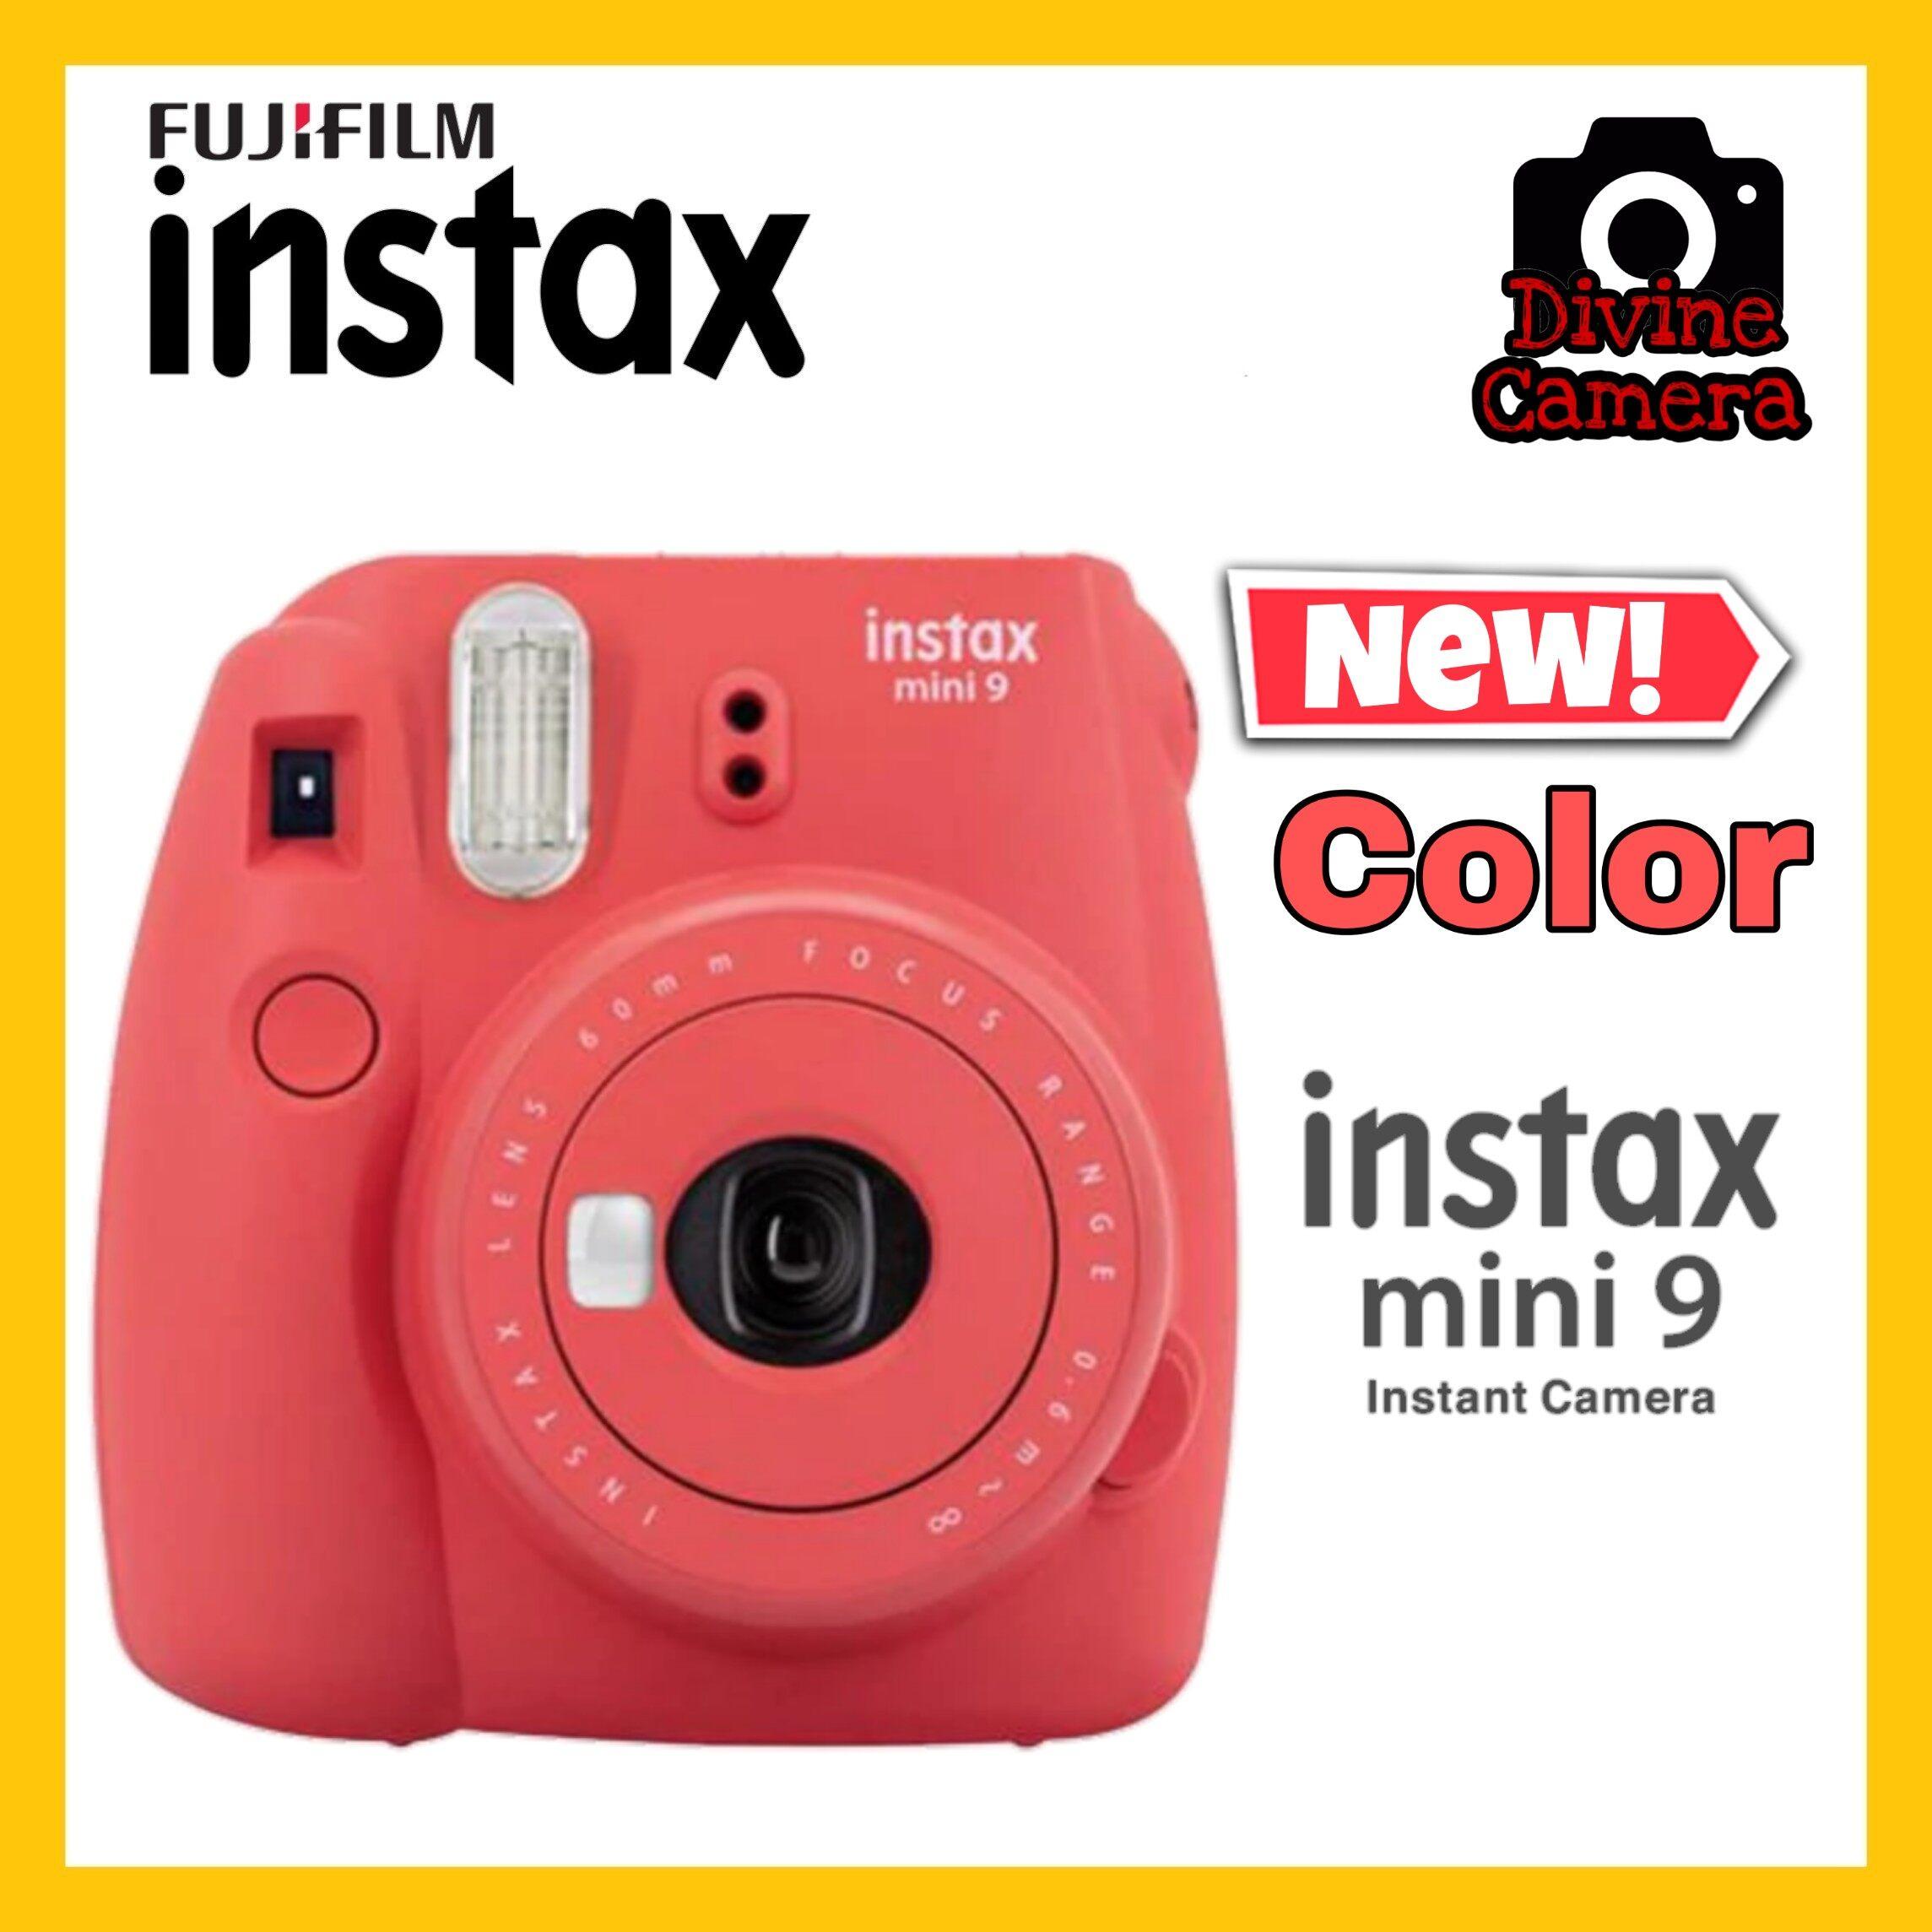 FUJIFILM INSTAX Mini 9 Instant Film Camera 2020 New Color (Poppy Red)